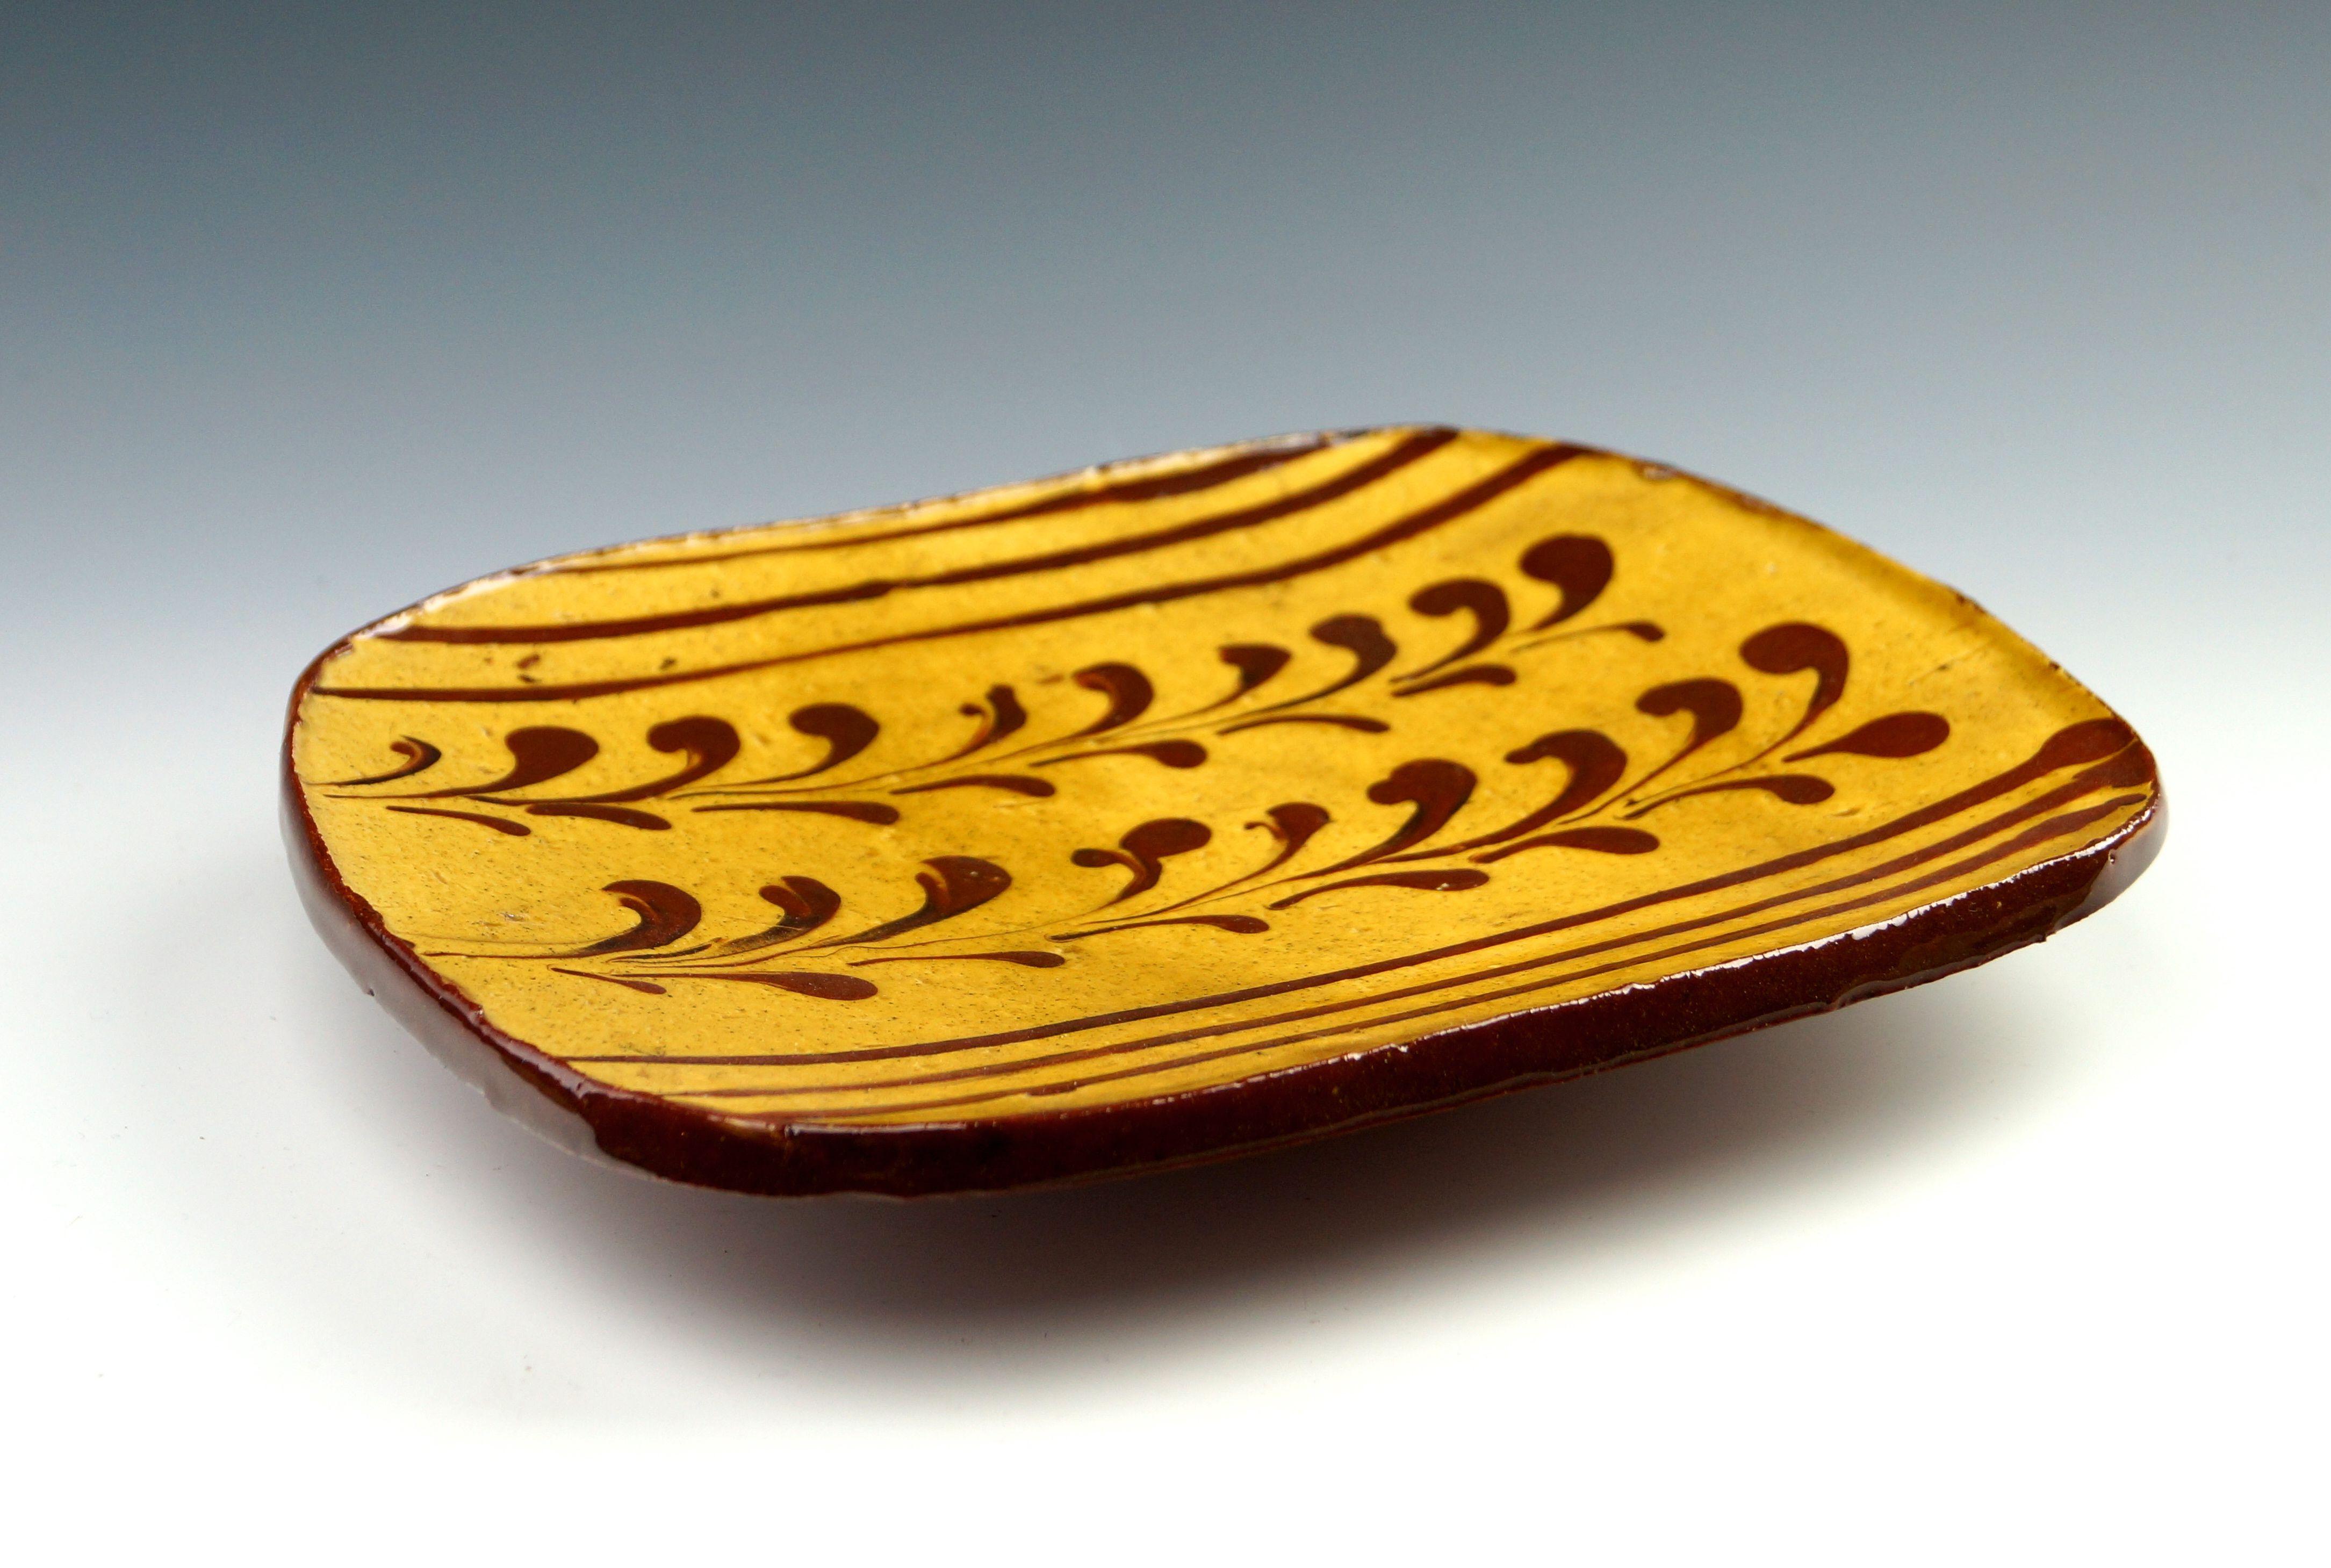 Clive Bowen Dish